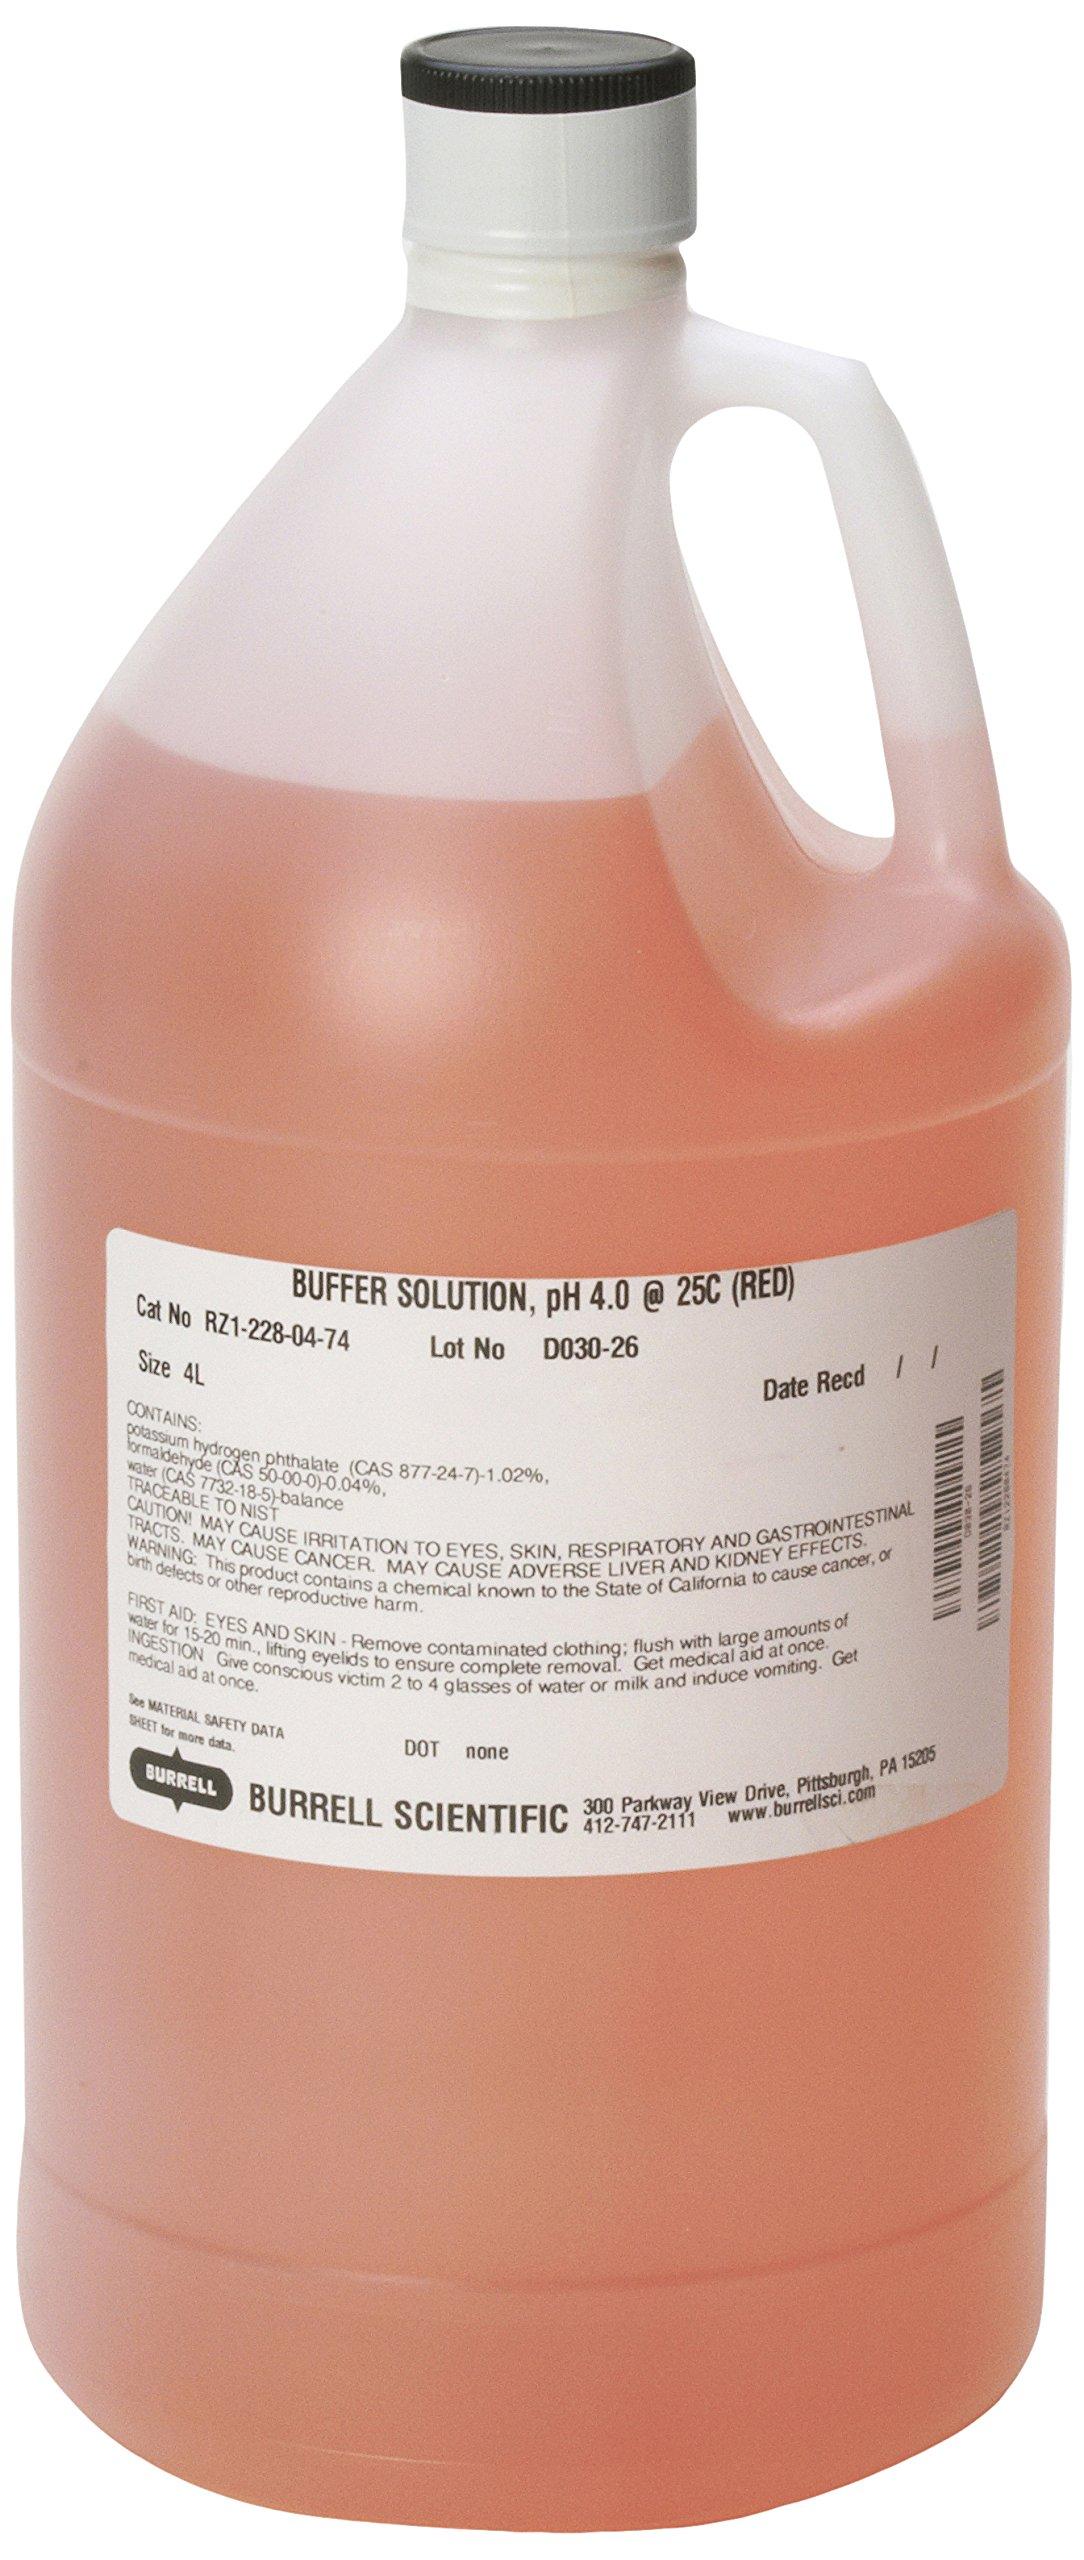 Burrell Scientific RZ1-228-04-74 Buffer Solution, 4.0 pH, 4 L, Red